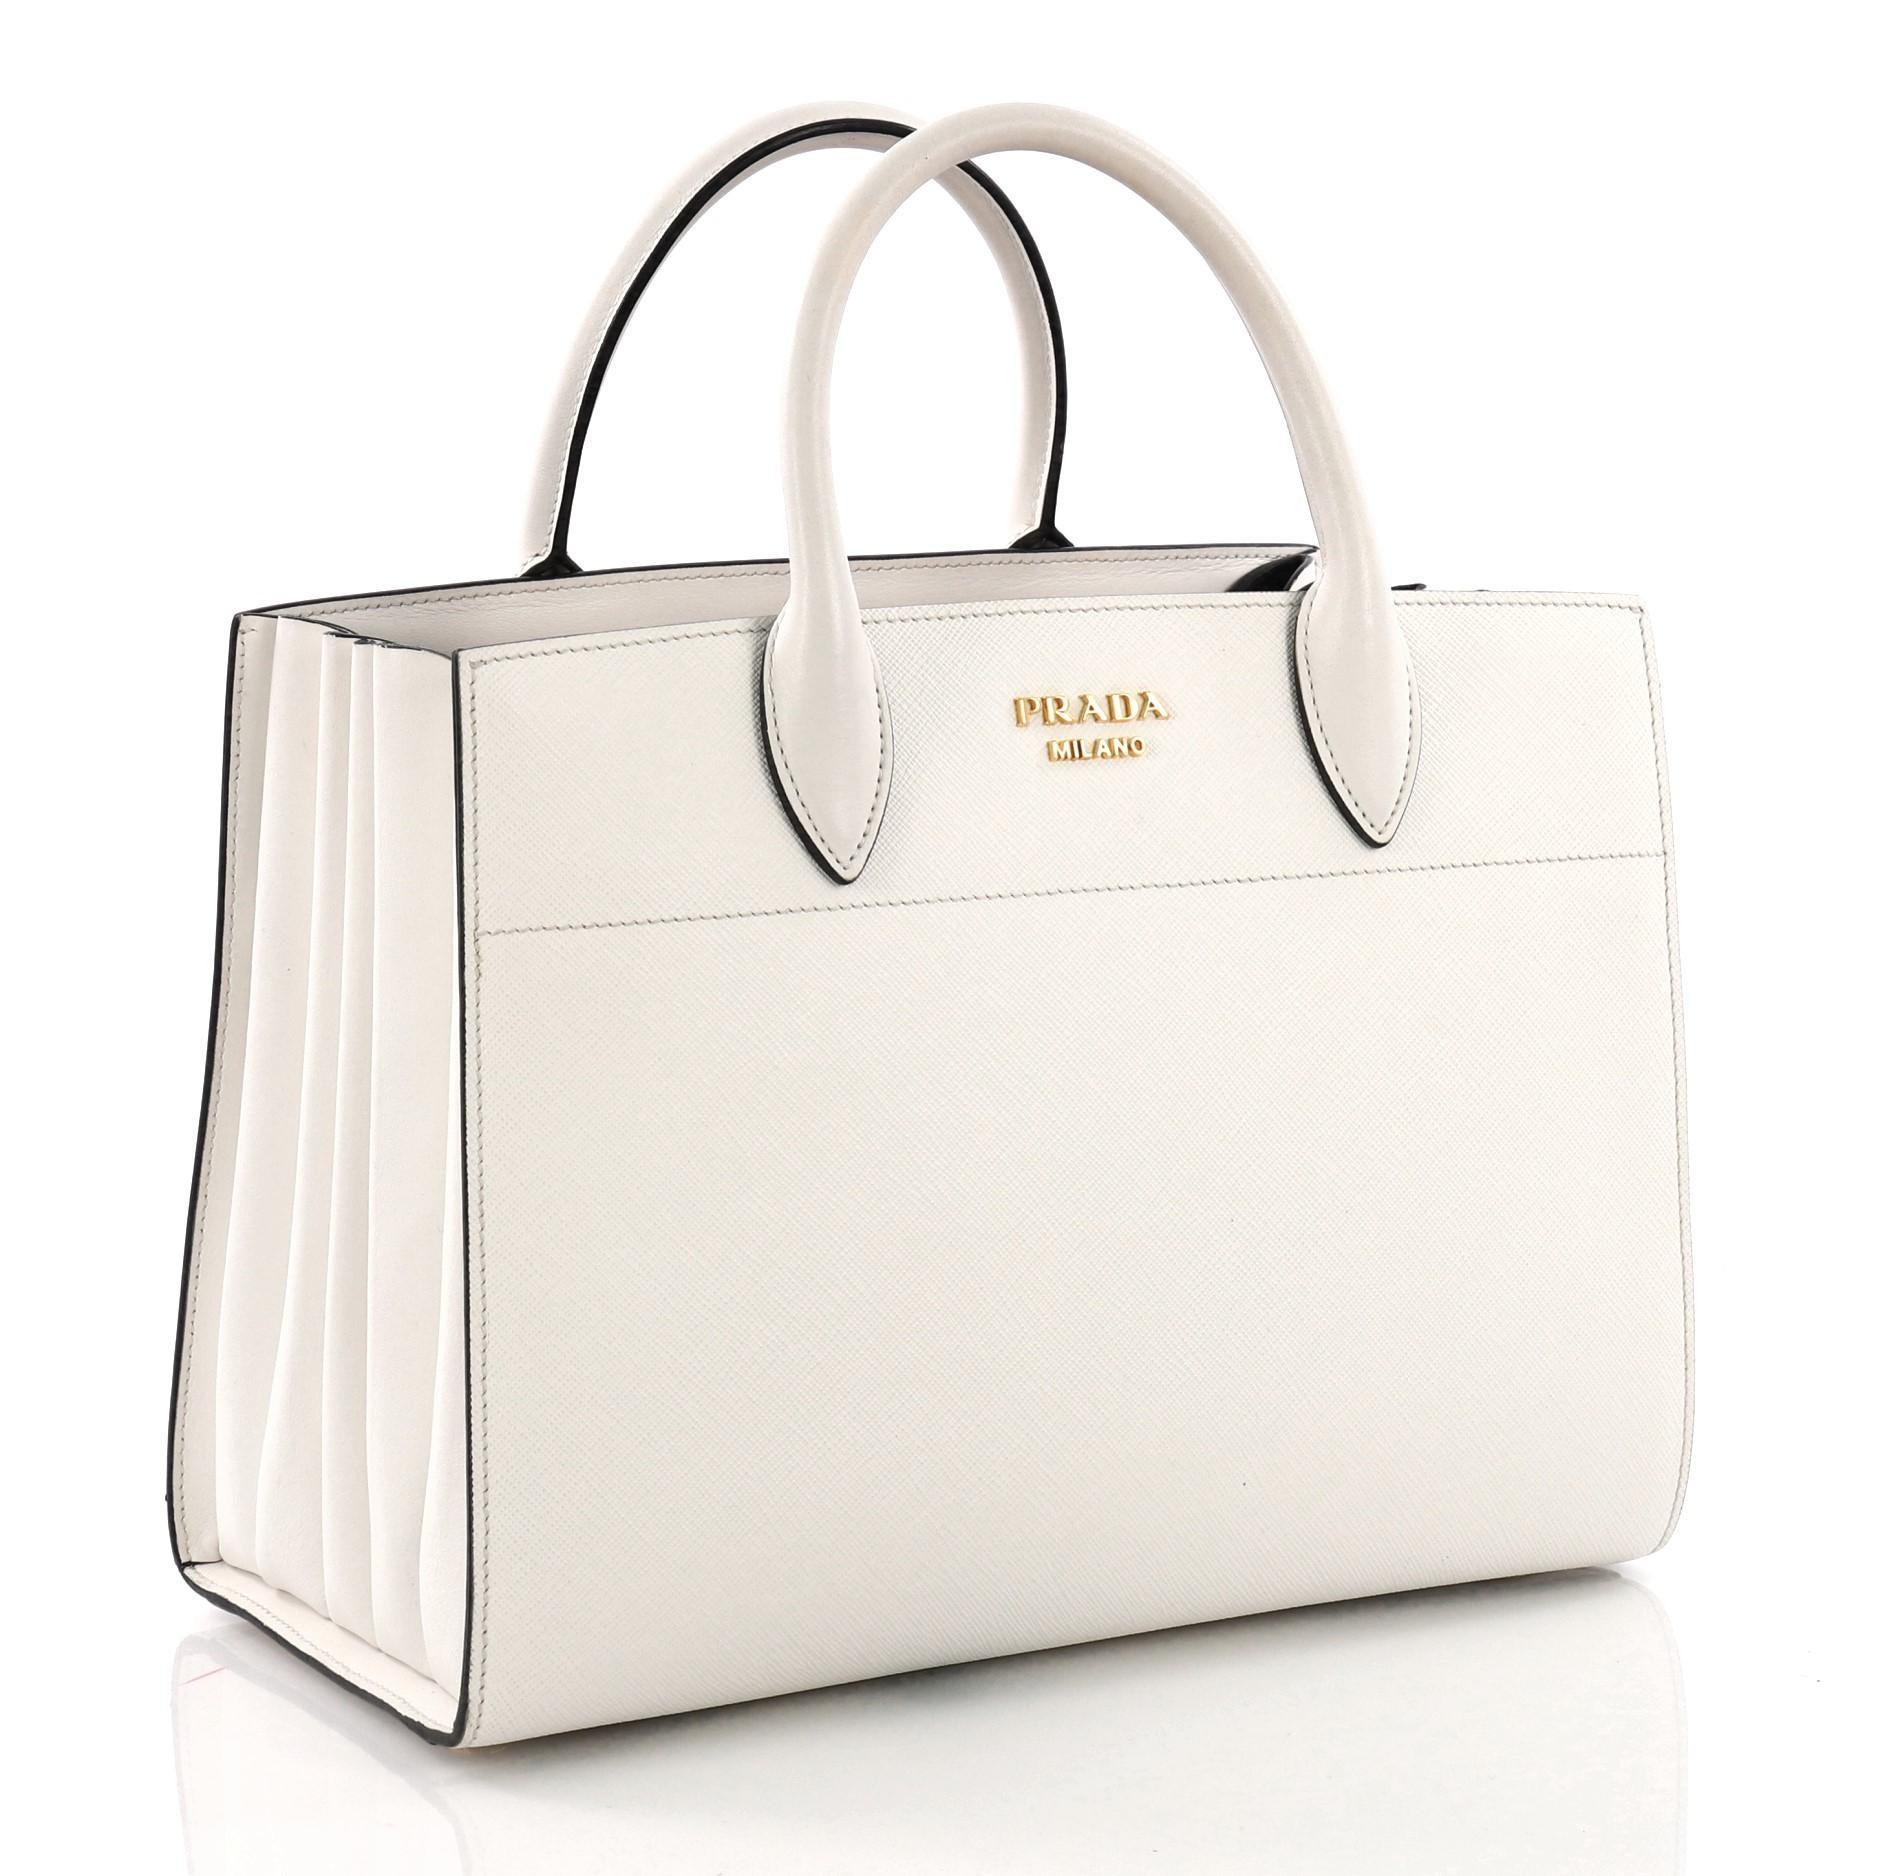 62dd4f0cdb Prada Bibliotheque Handbag Saffiano Leather with City Calfskin Medium at  1stdibs